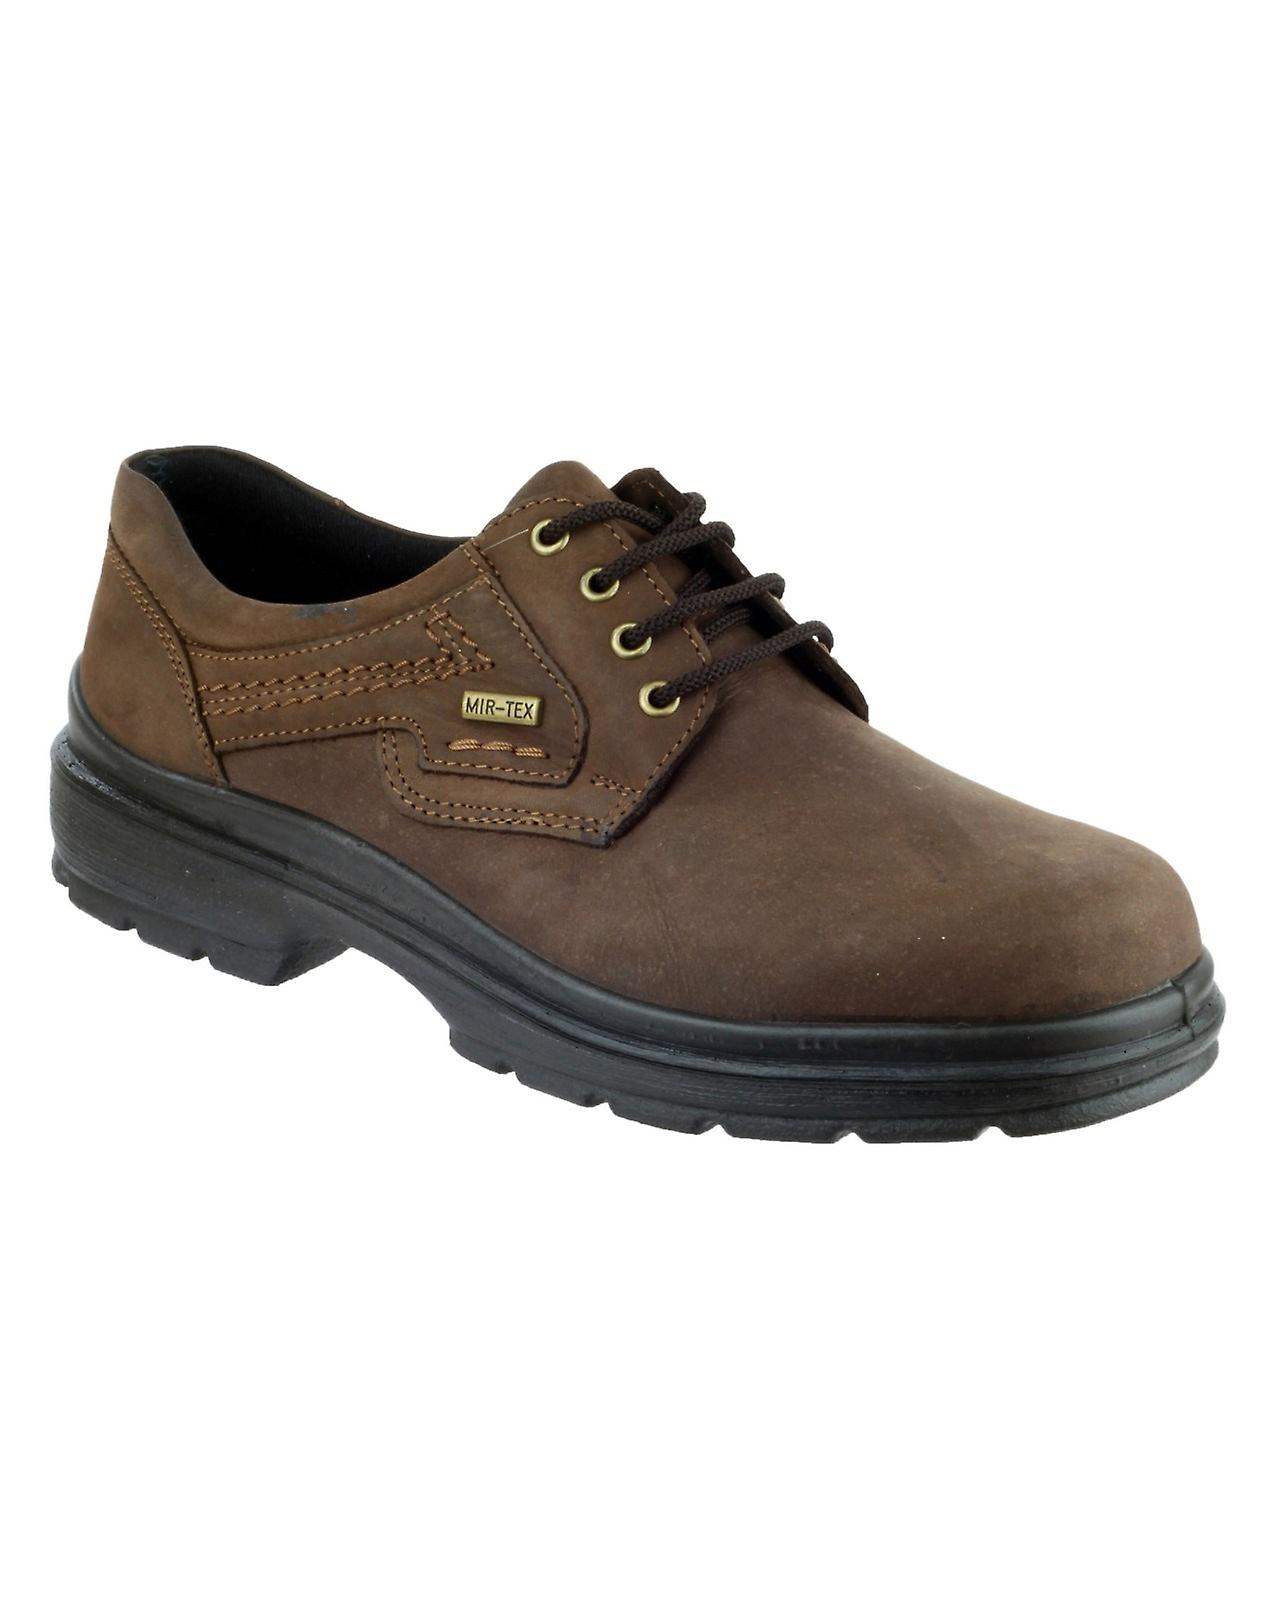 Cotswold Shipston Lace Up Shoe